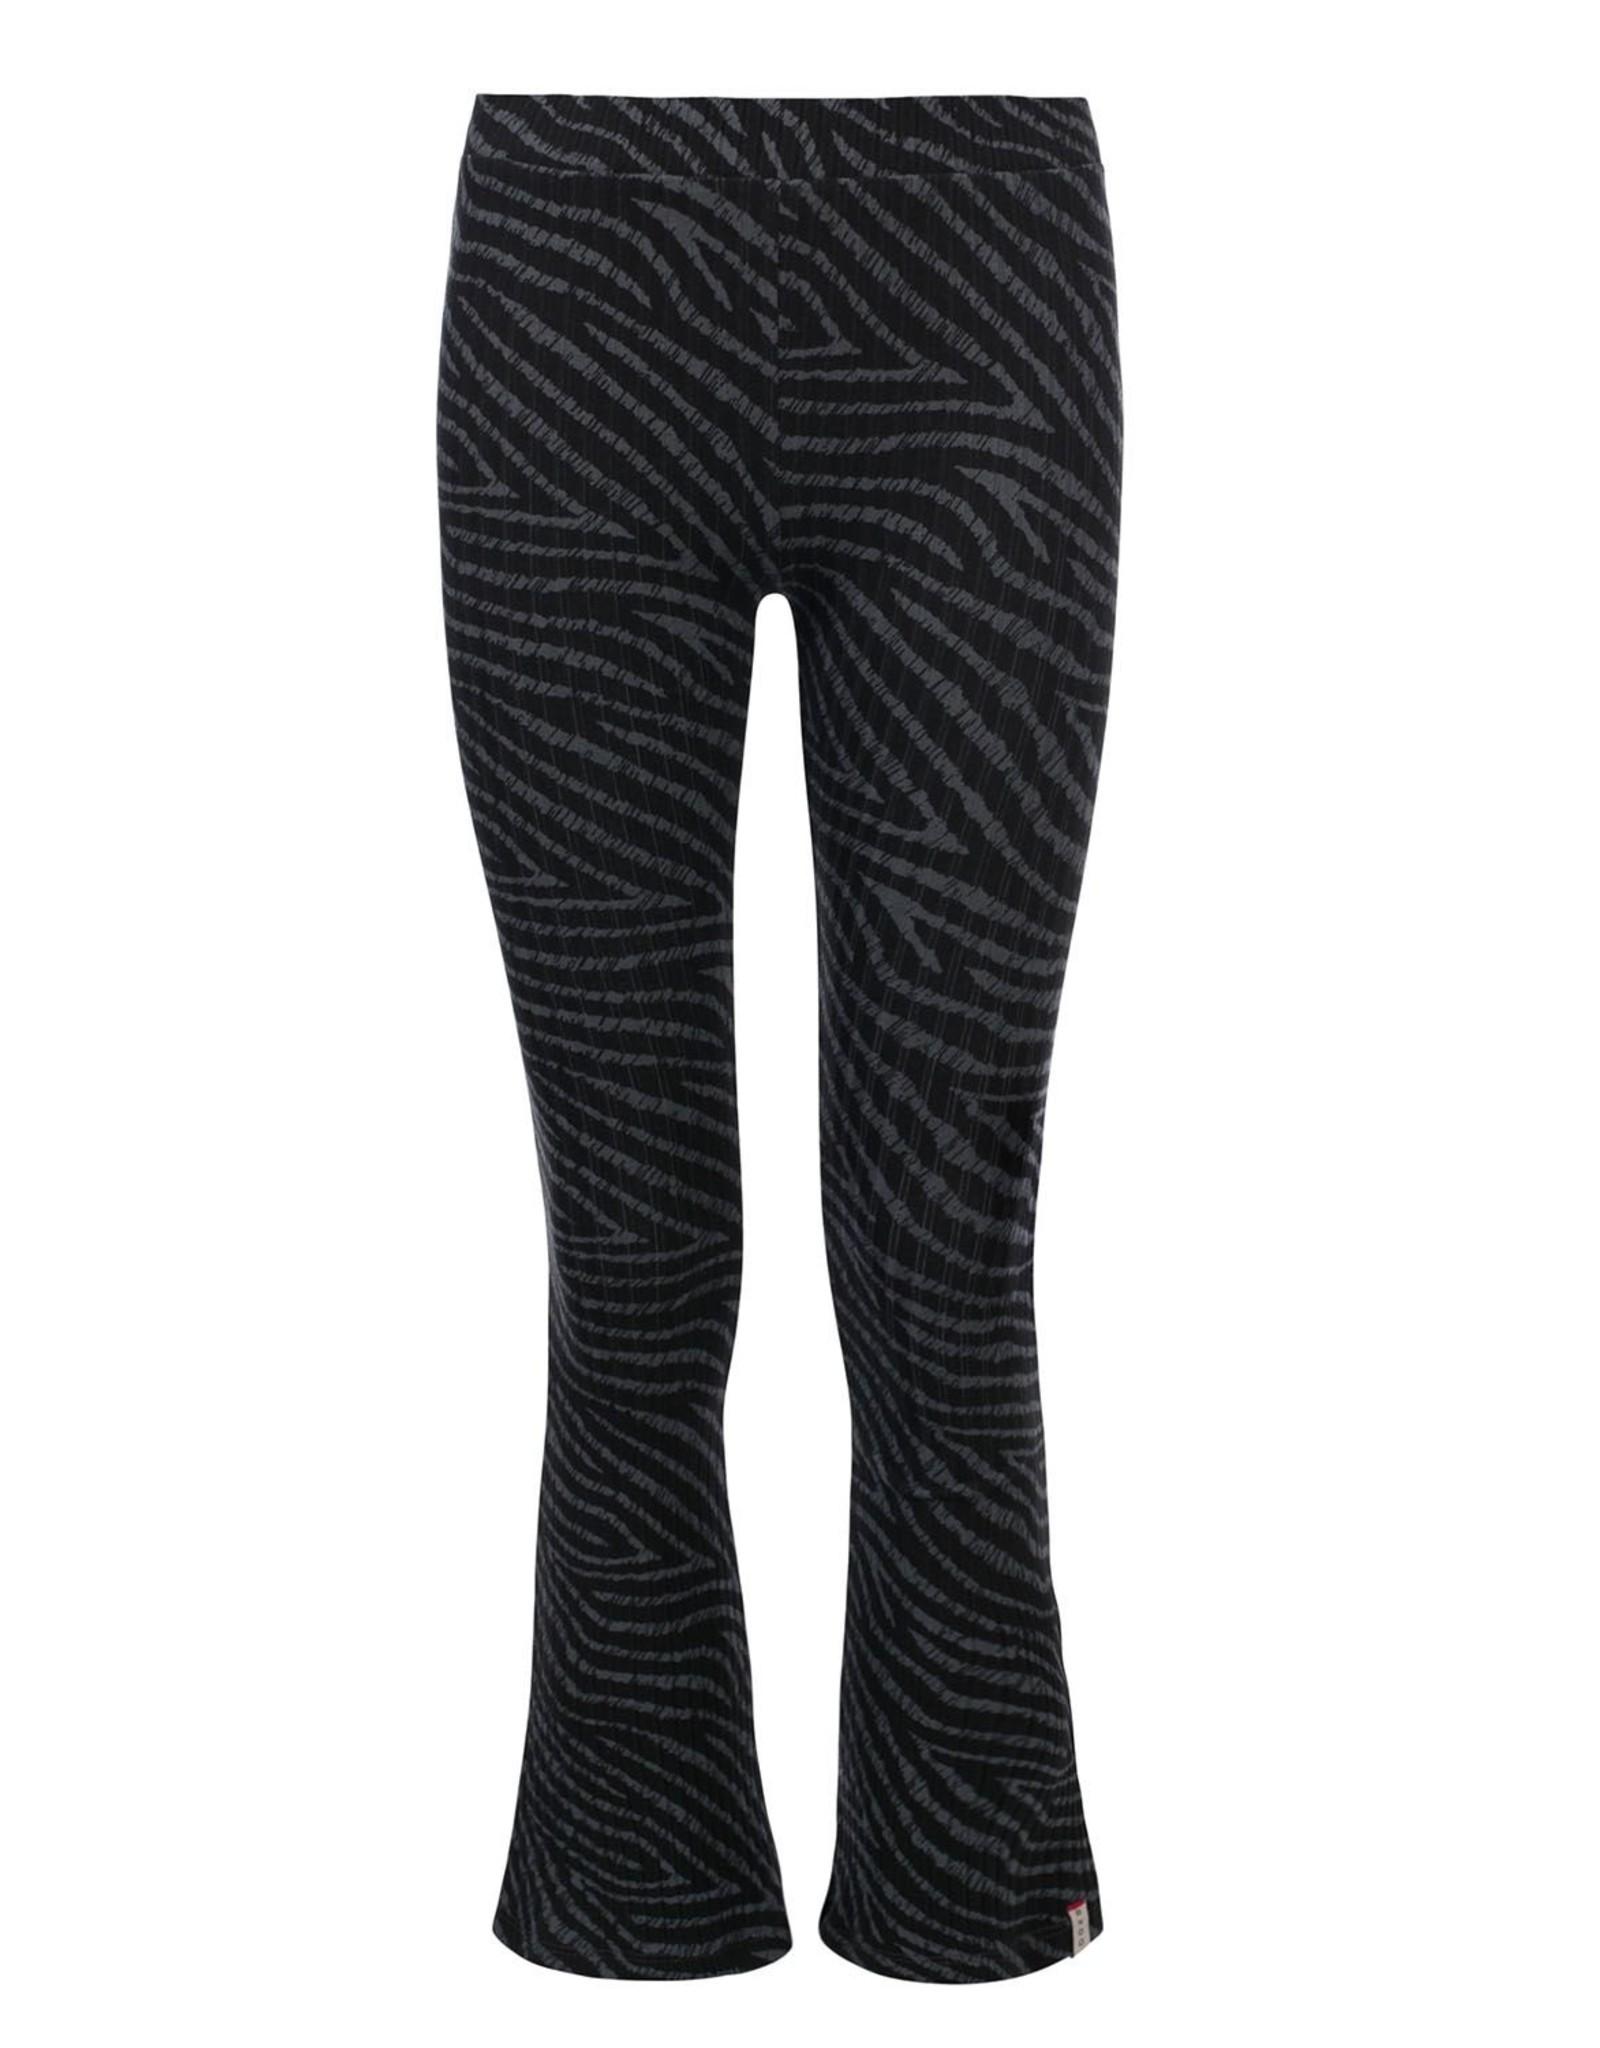 Looxs 10SIXTEEN 10Sixteen Tie dye flare pants1